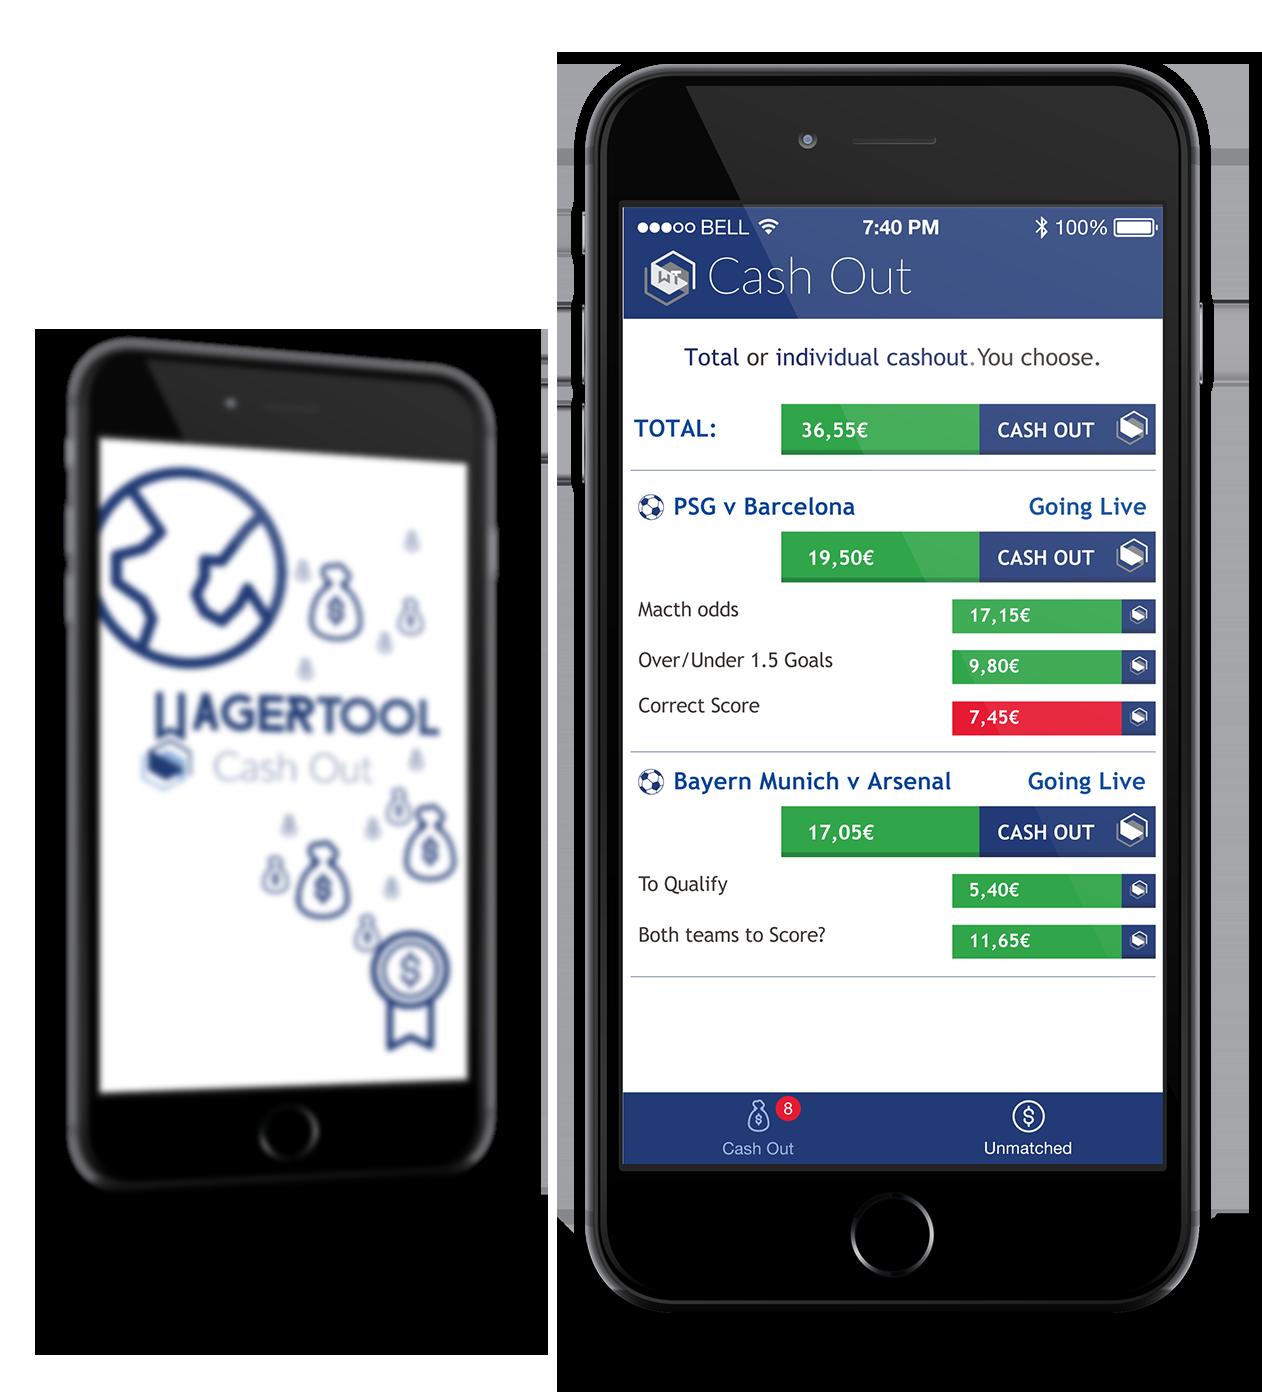 cashoutmockup frontglobal   Aplicativo de trading esportivo gratuito: Disponível paraAndroid eiOS | Wagertool